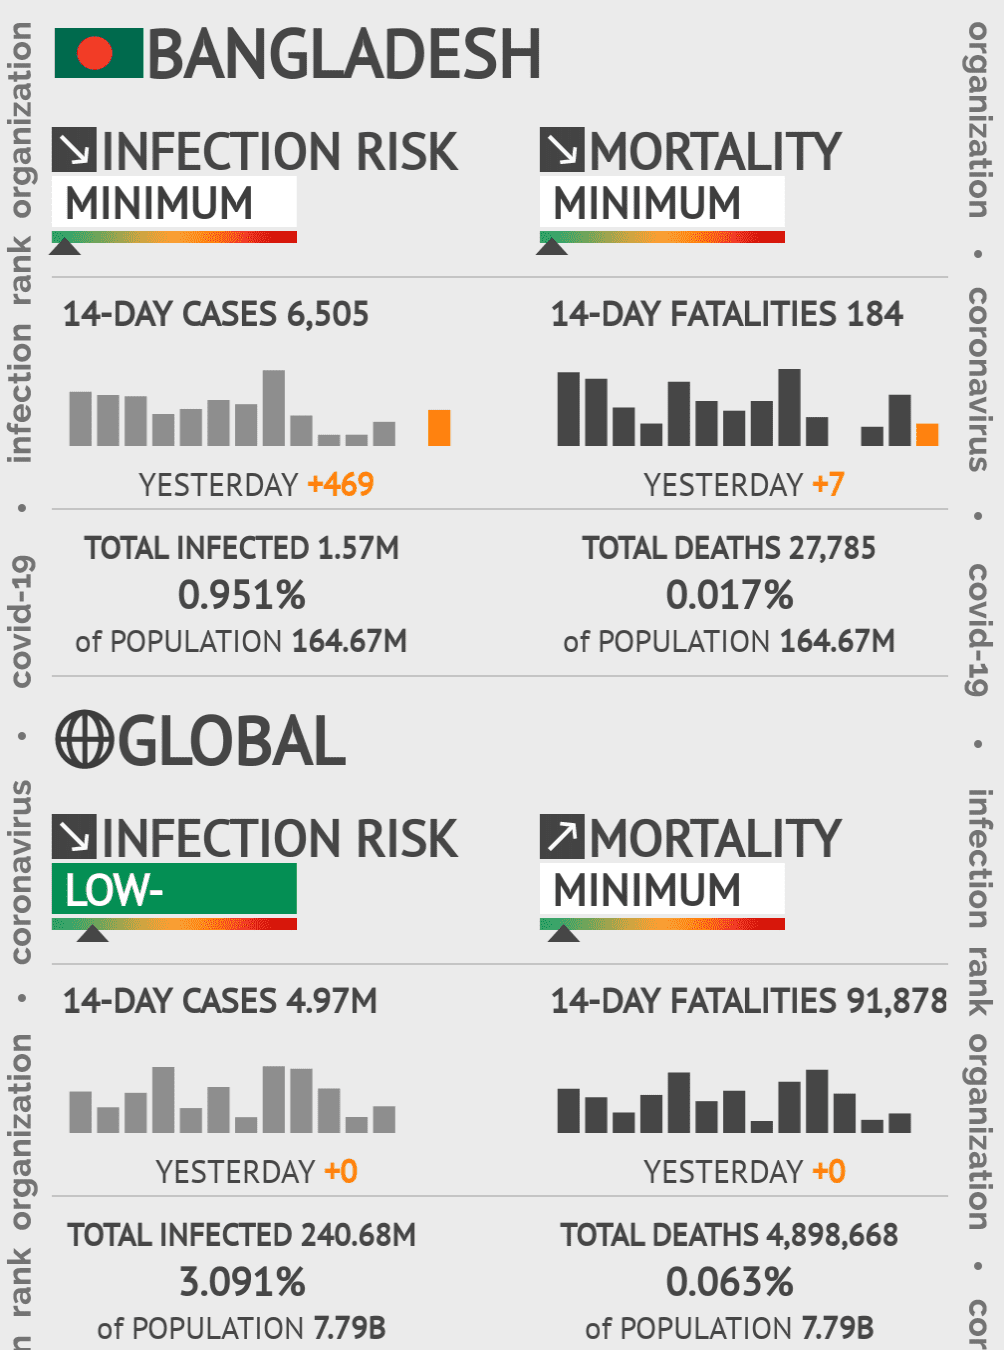 Bangladesh Coronavirus Covid-19 Risk of Infection on February 24, 2021